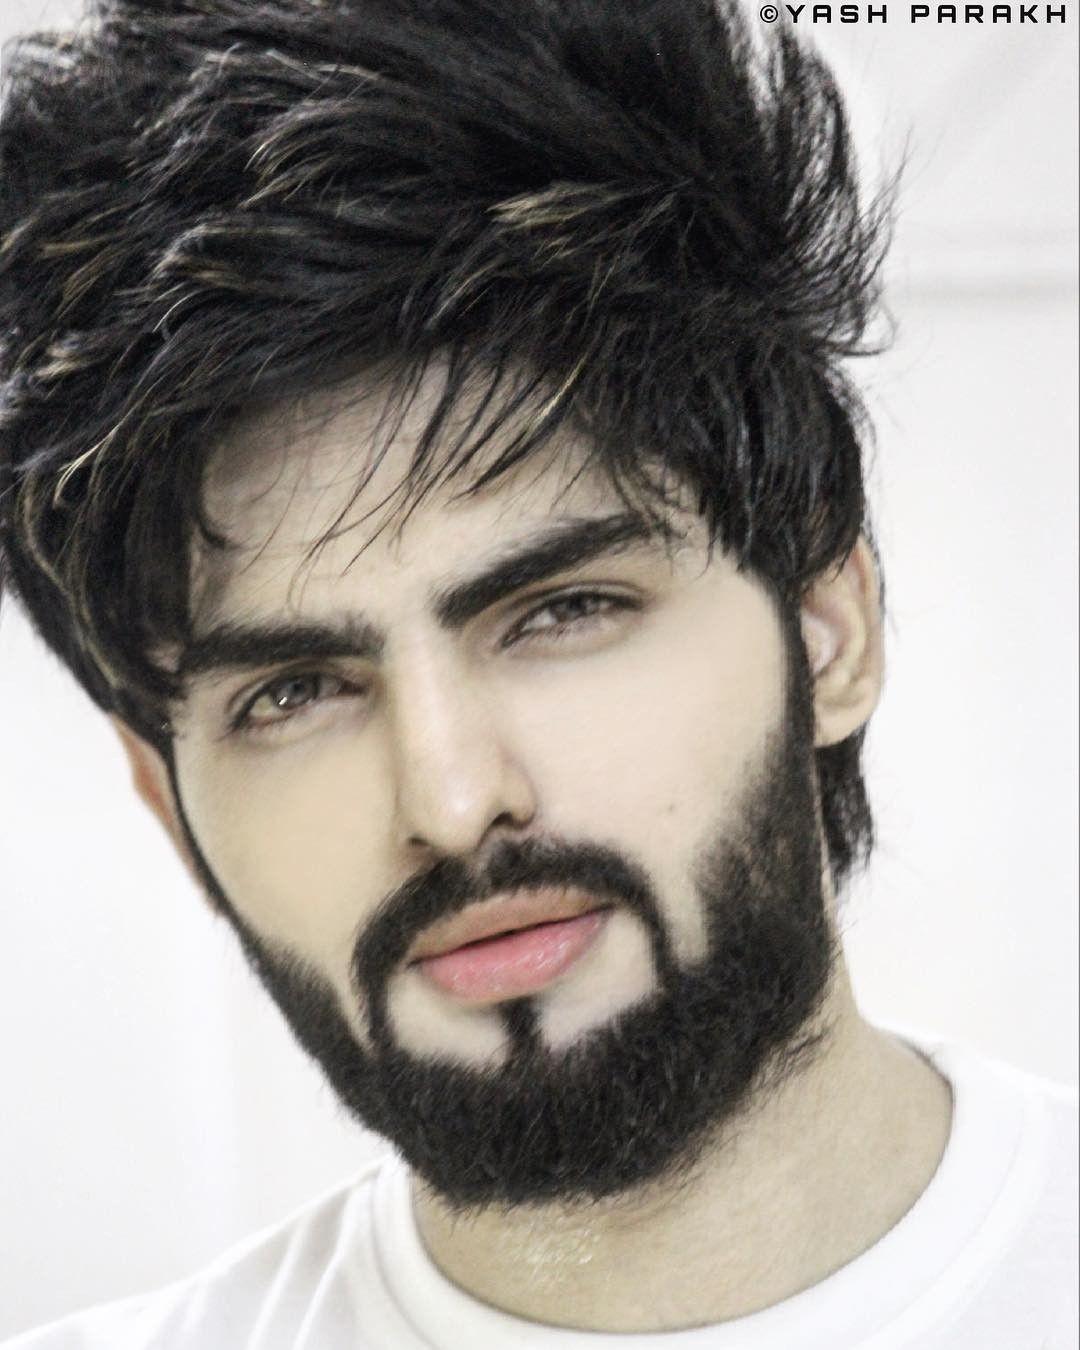 Https I Pinimg Com Originals F0 04 Db F004dbab9bc9f75c75bede4a8ff27417 Jpg Men Haircut Styles Boy Hairstyles Beard Styles For Men